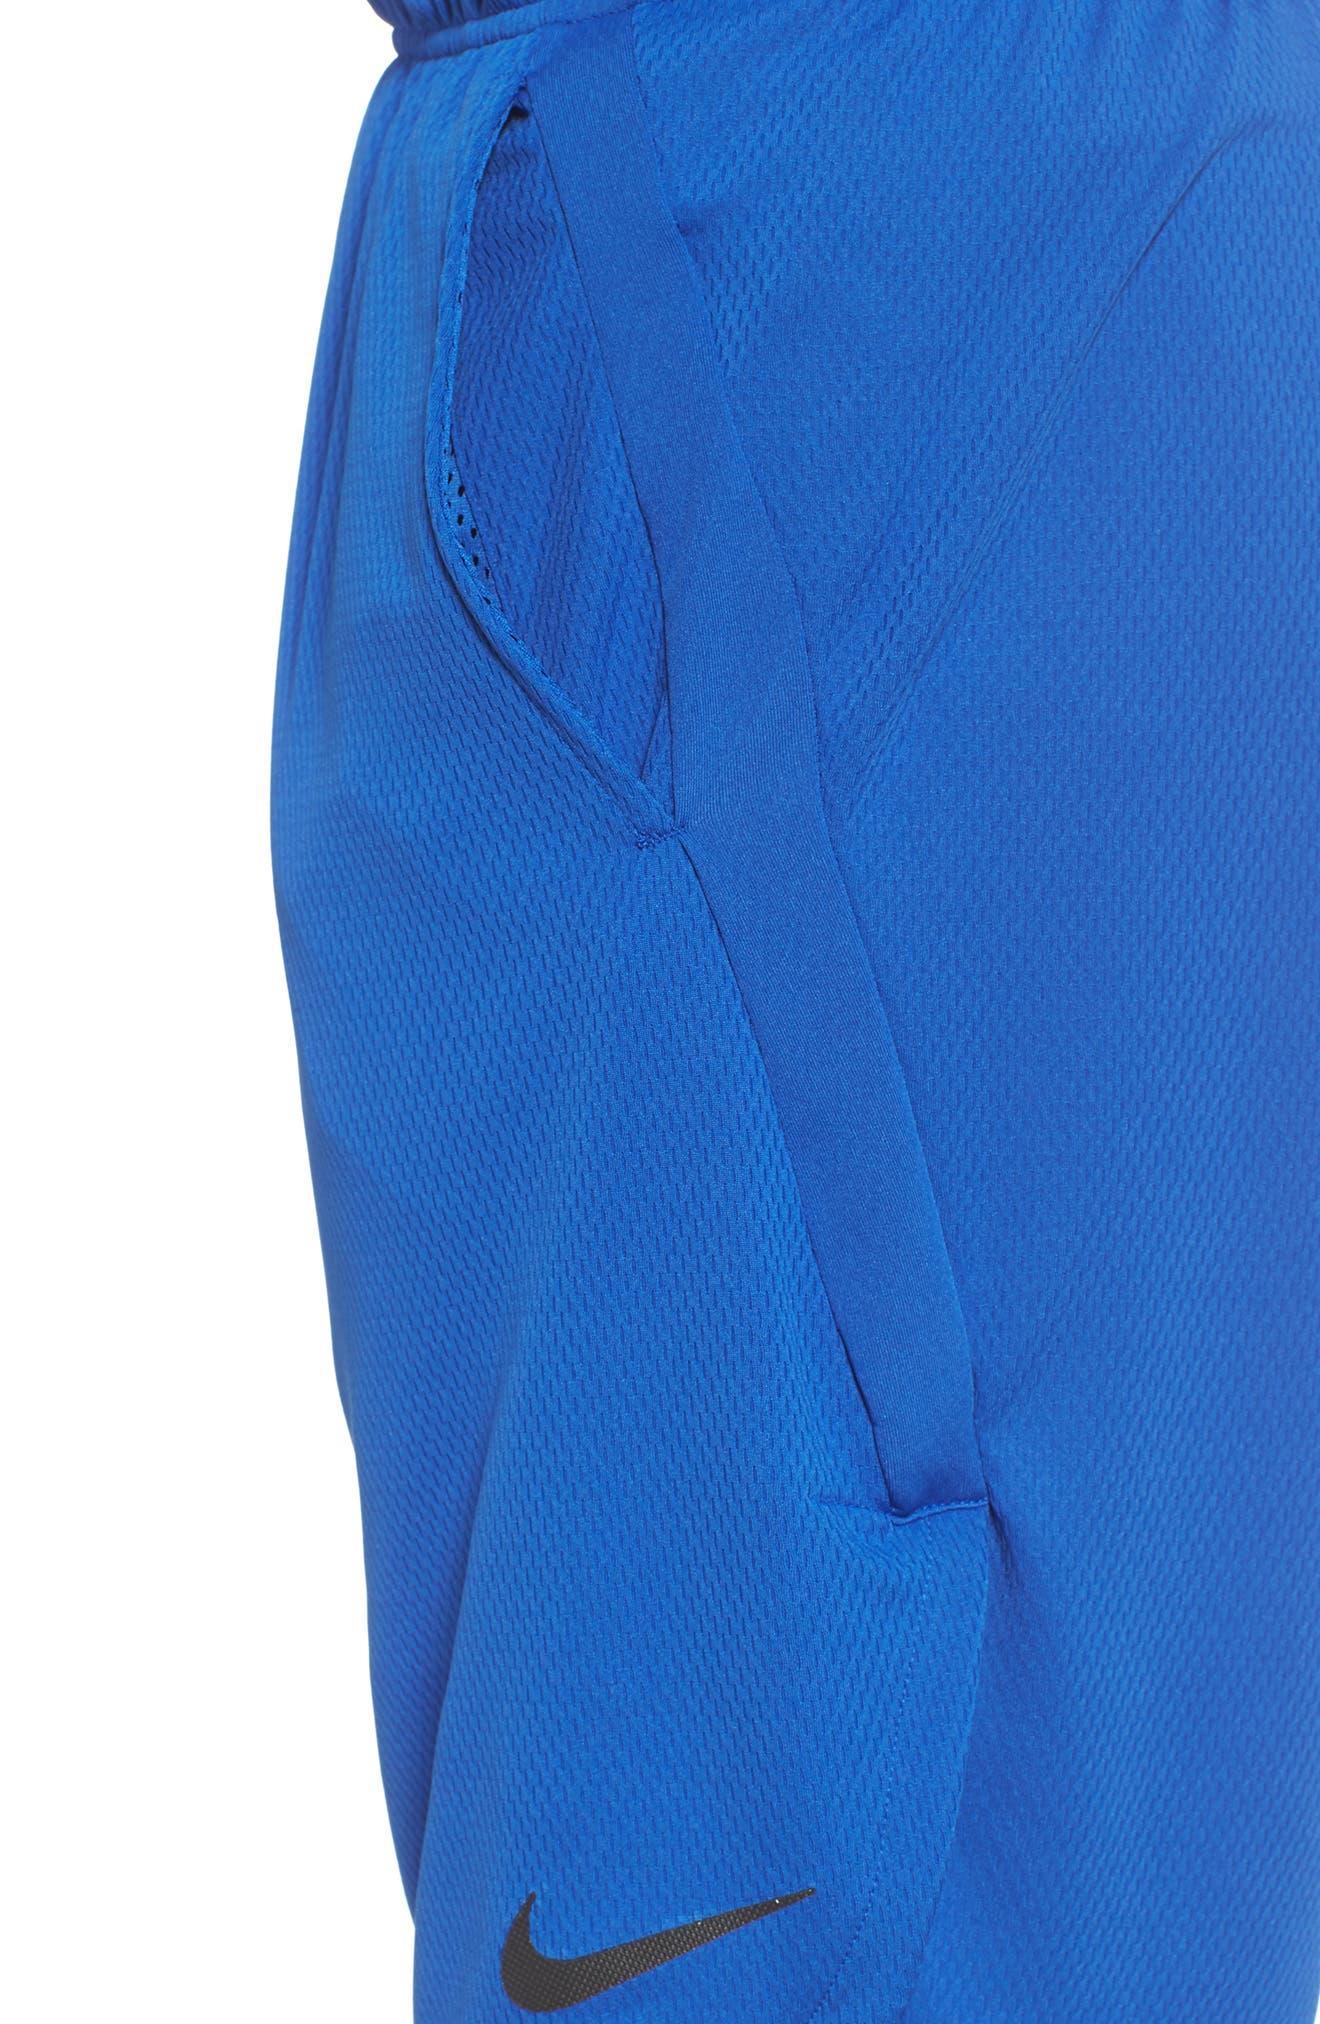 Training Dry 4.0 Shorts,                             Alternate thumbnail 21, color,